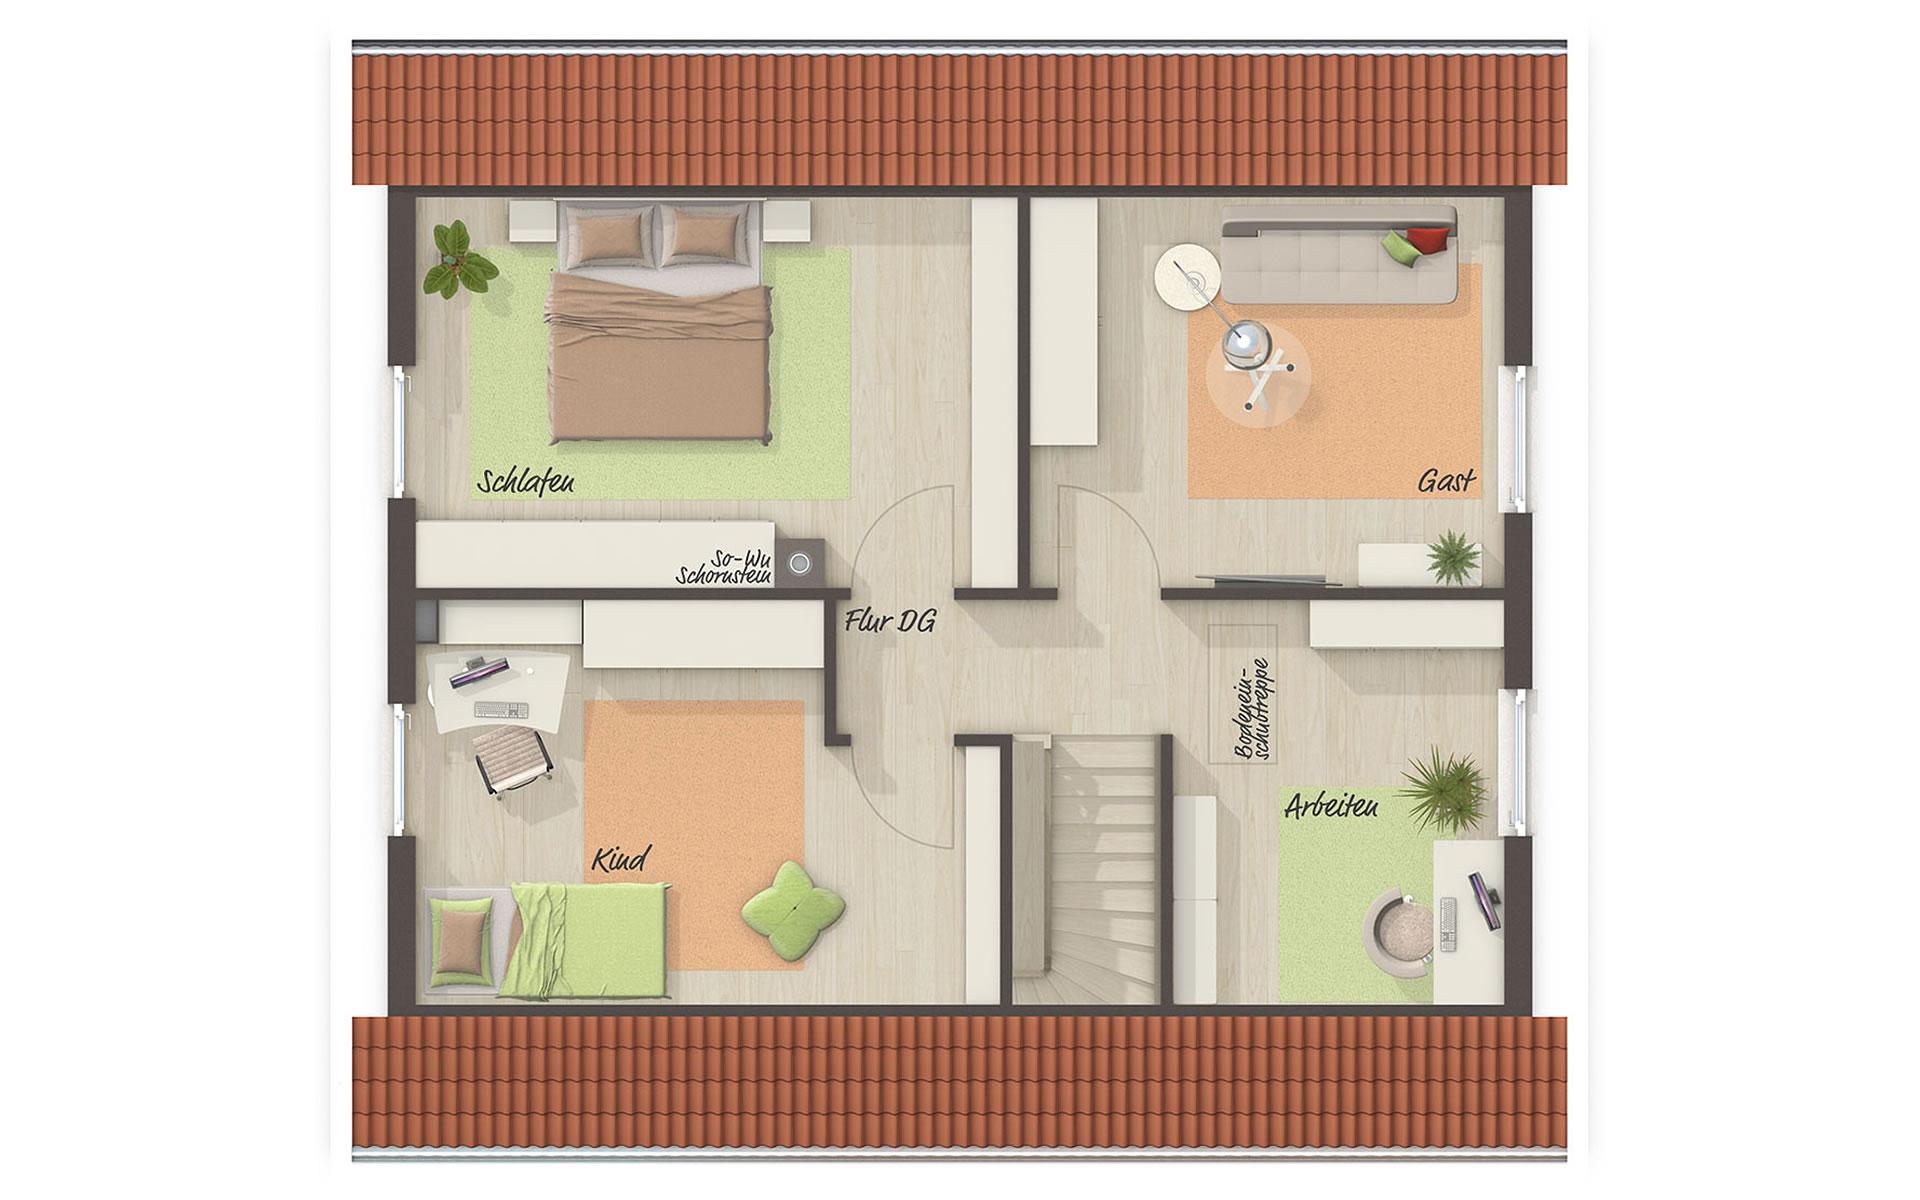 Dachgeschoss Aktionshaus Aspekt 133 von Town & Country Haus Lizenzgeber GmbH